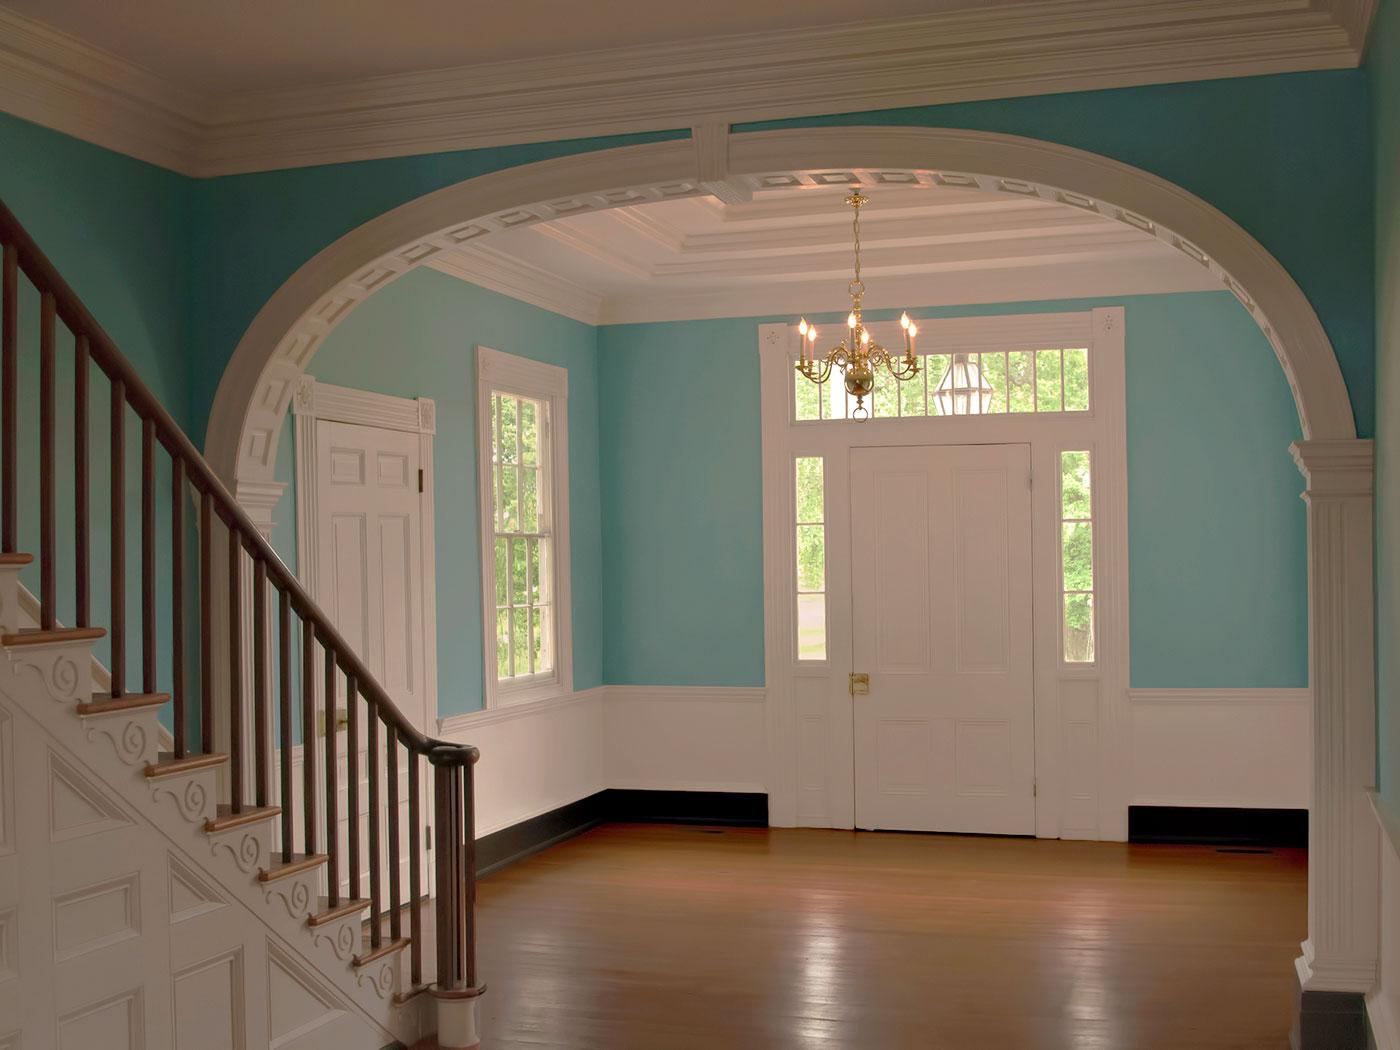 Interior Renovations - Craftworks Custom Cabinetry - Rochester, NY